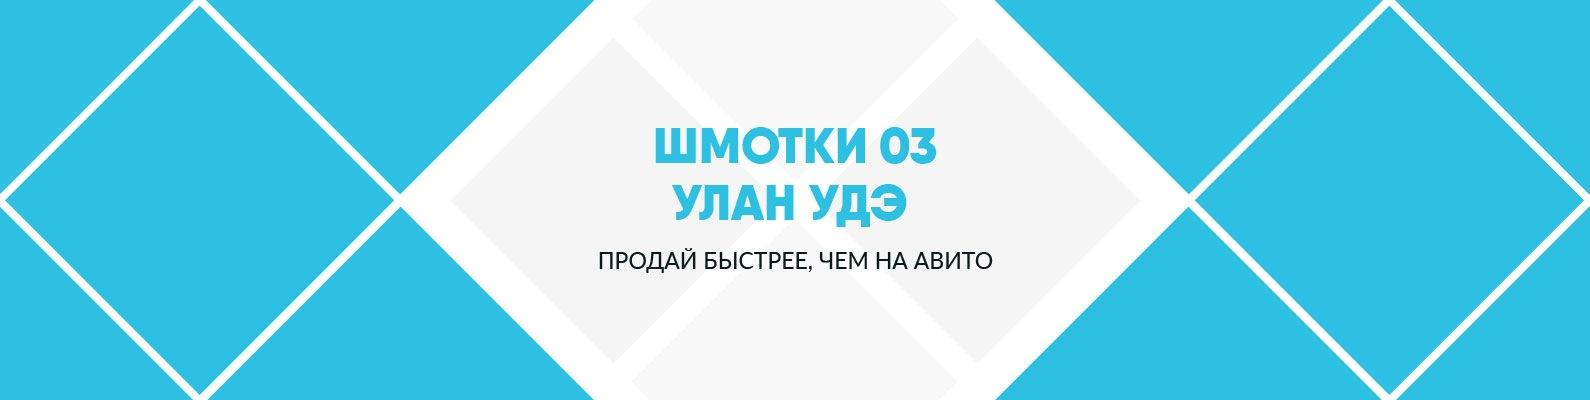 eab9201d0a551 Шмотки 03   Улан Удэ   ВКонтакте